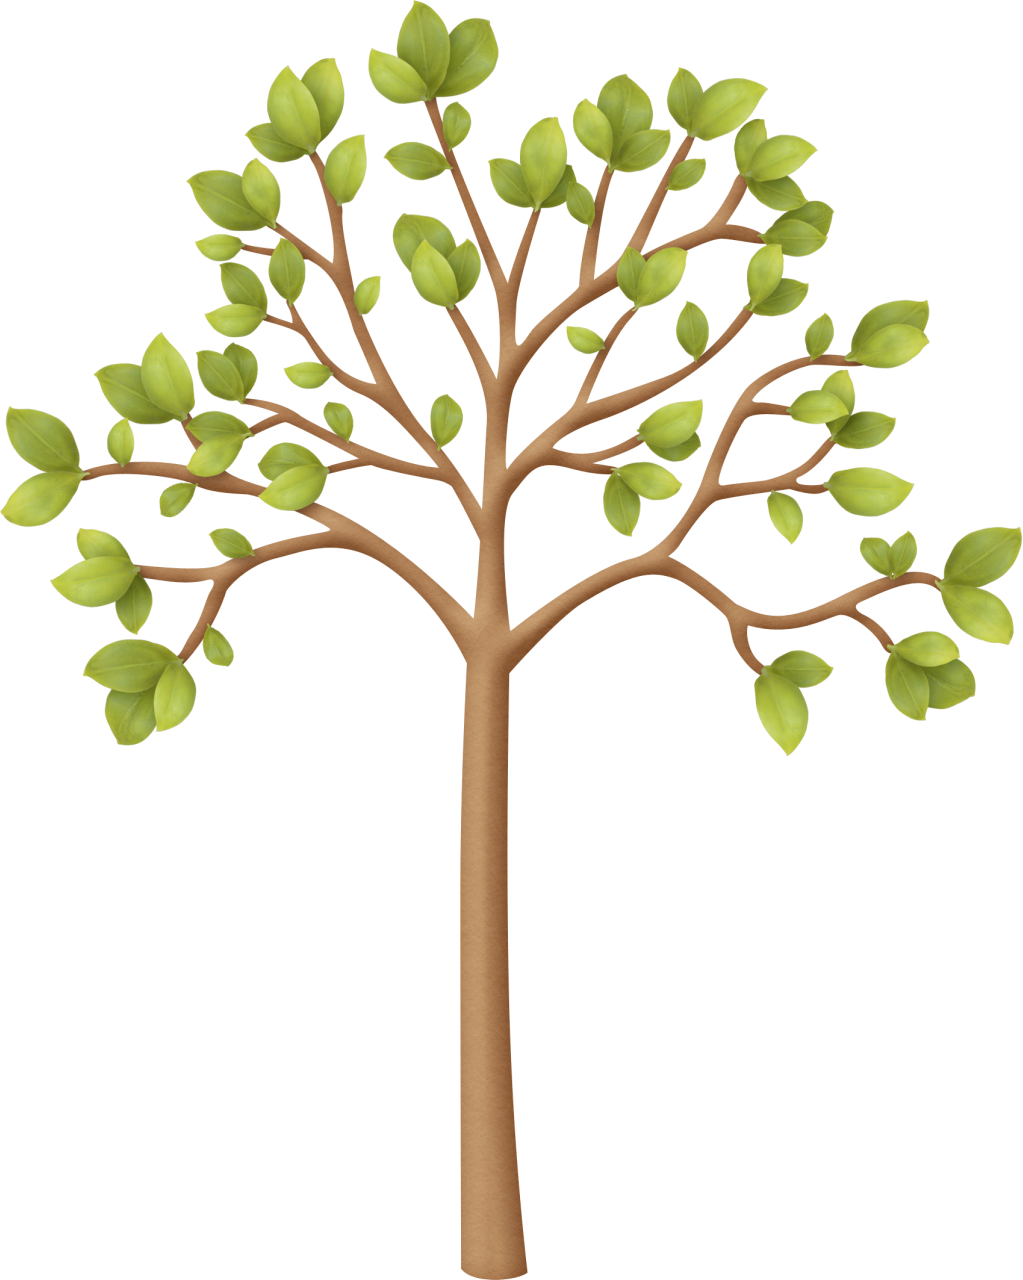 Gardening clipart tree plantation. Kaagard png planting and